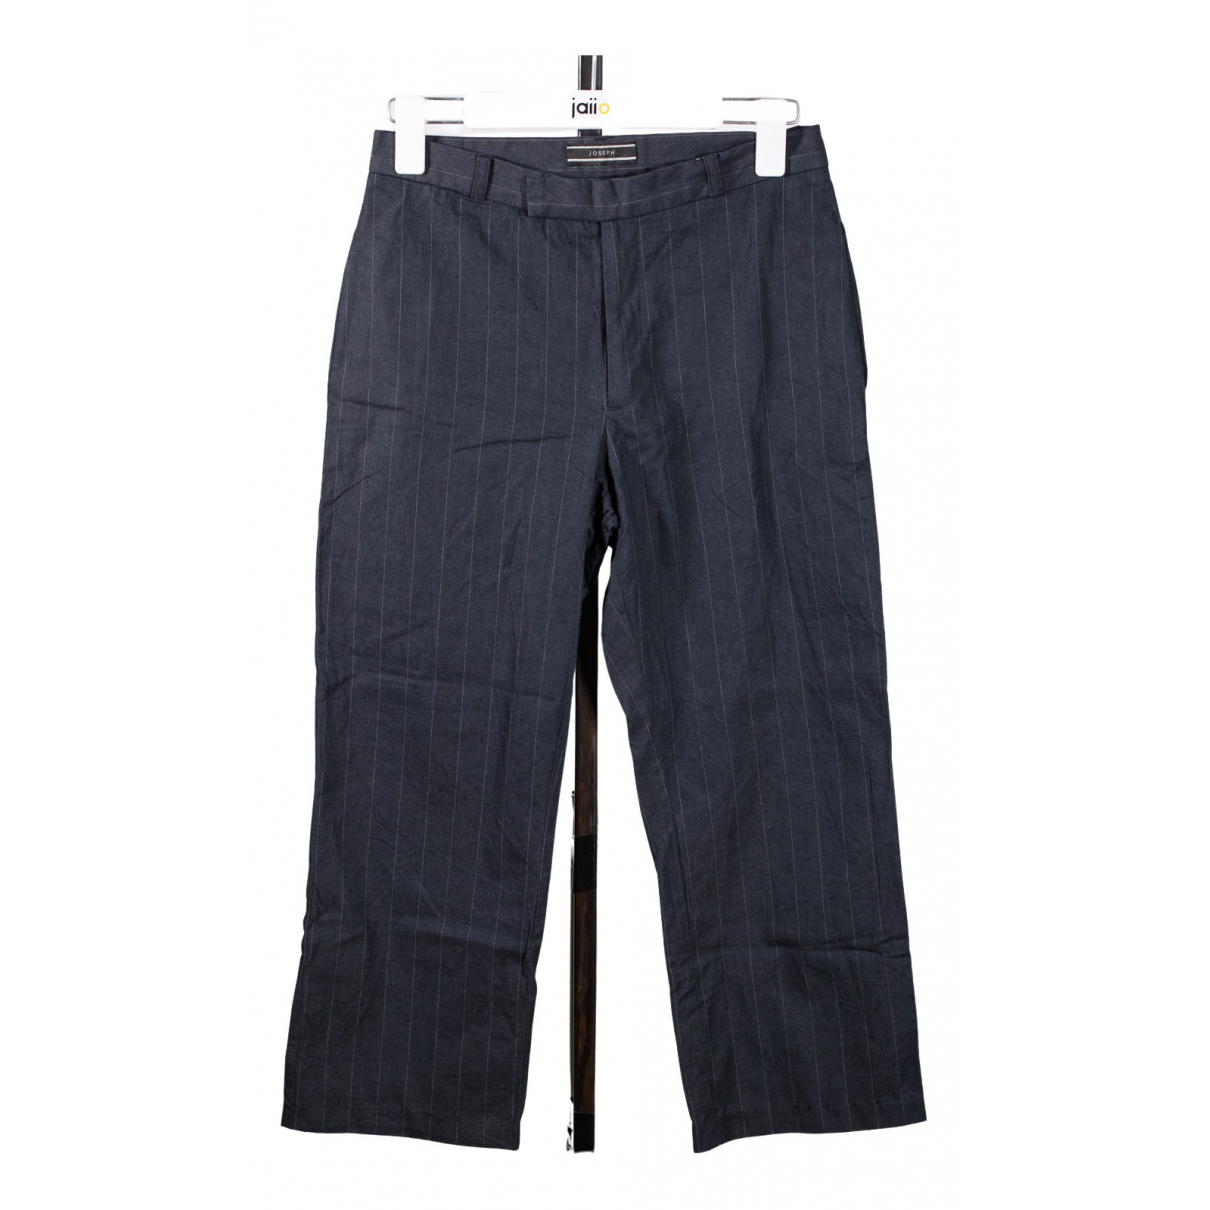 Pantalones en Algodon Gris Joseph